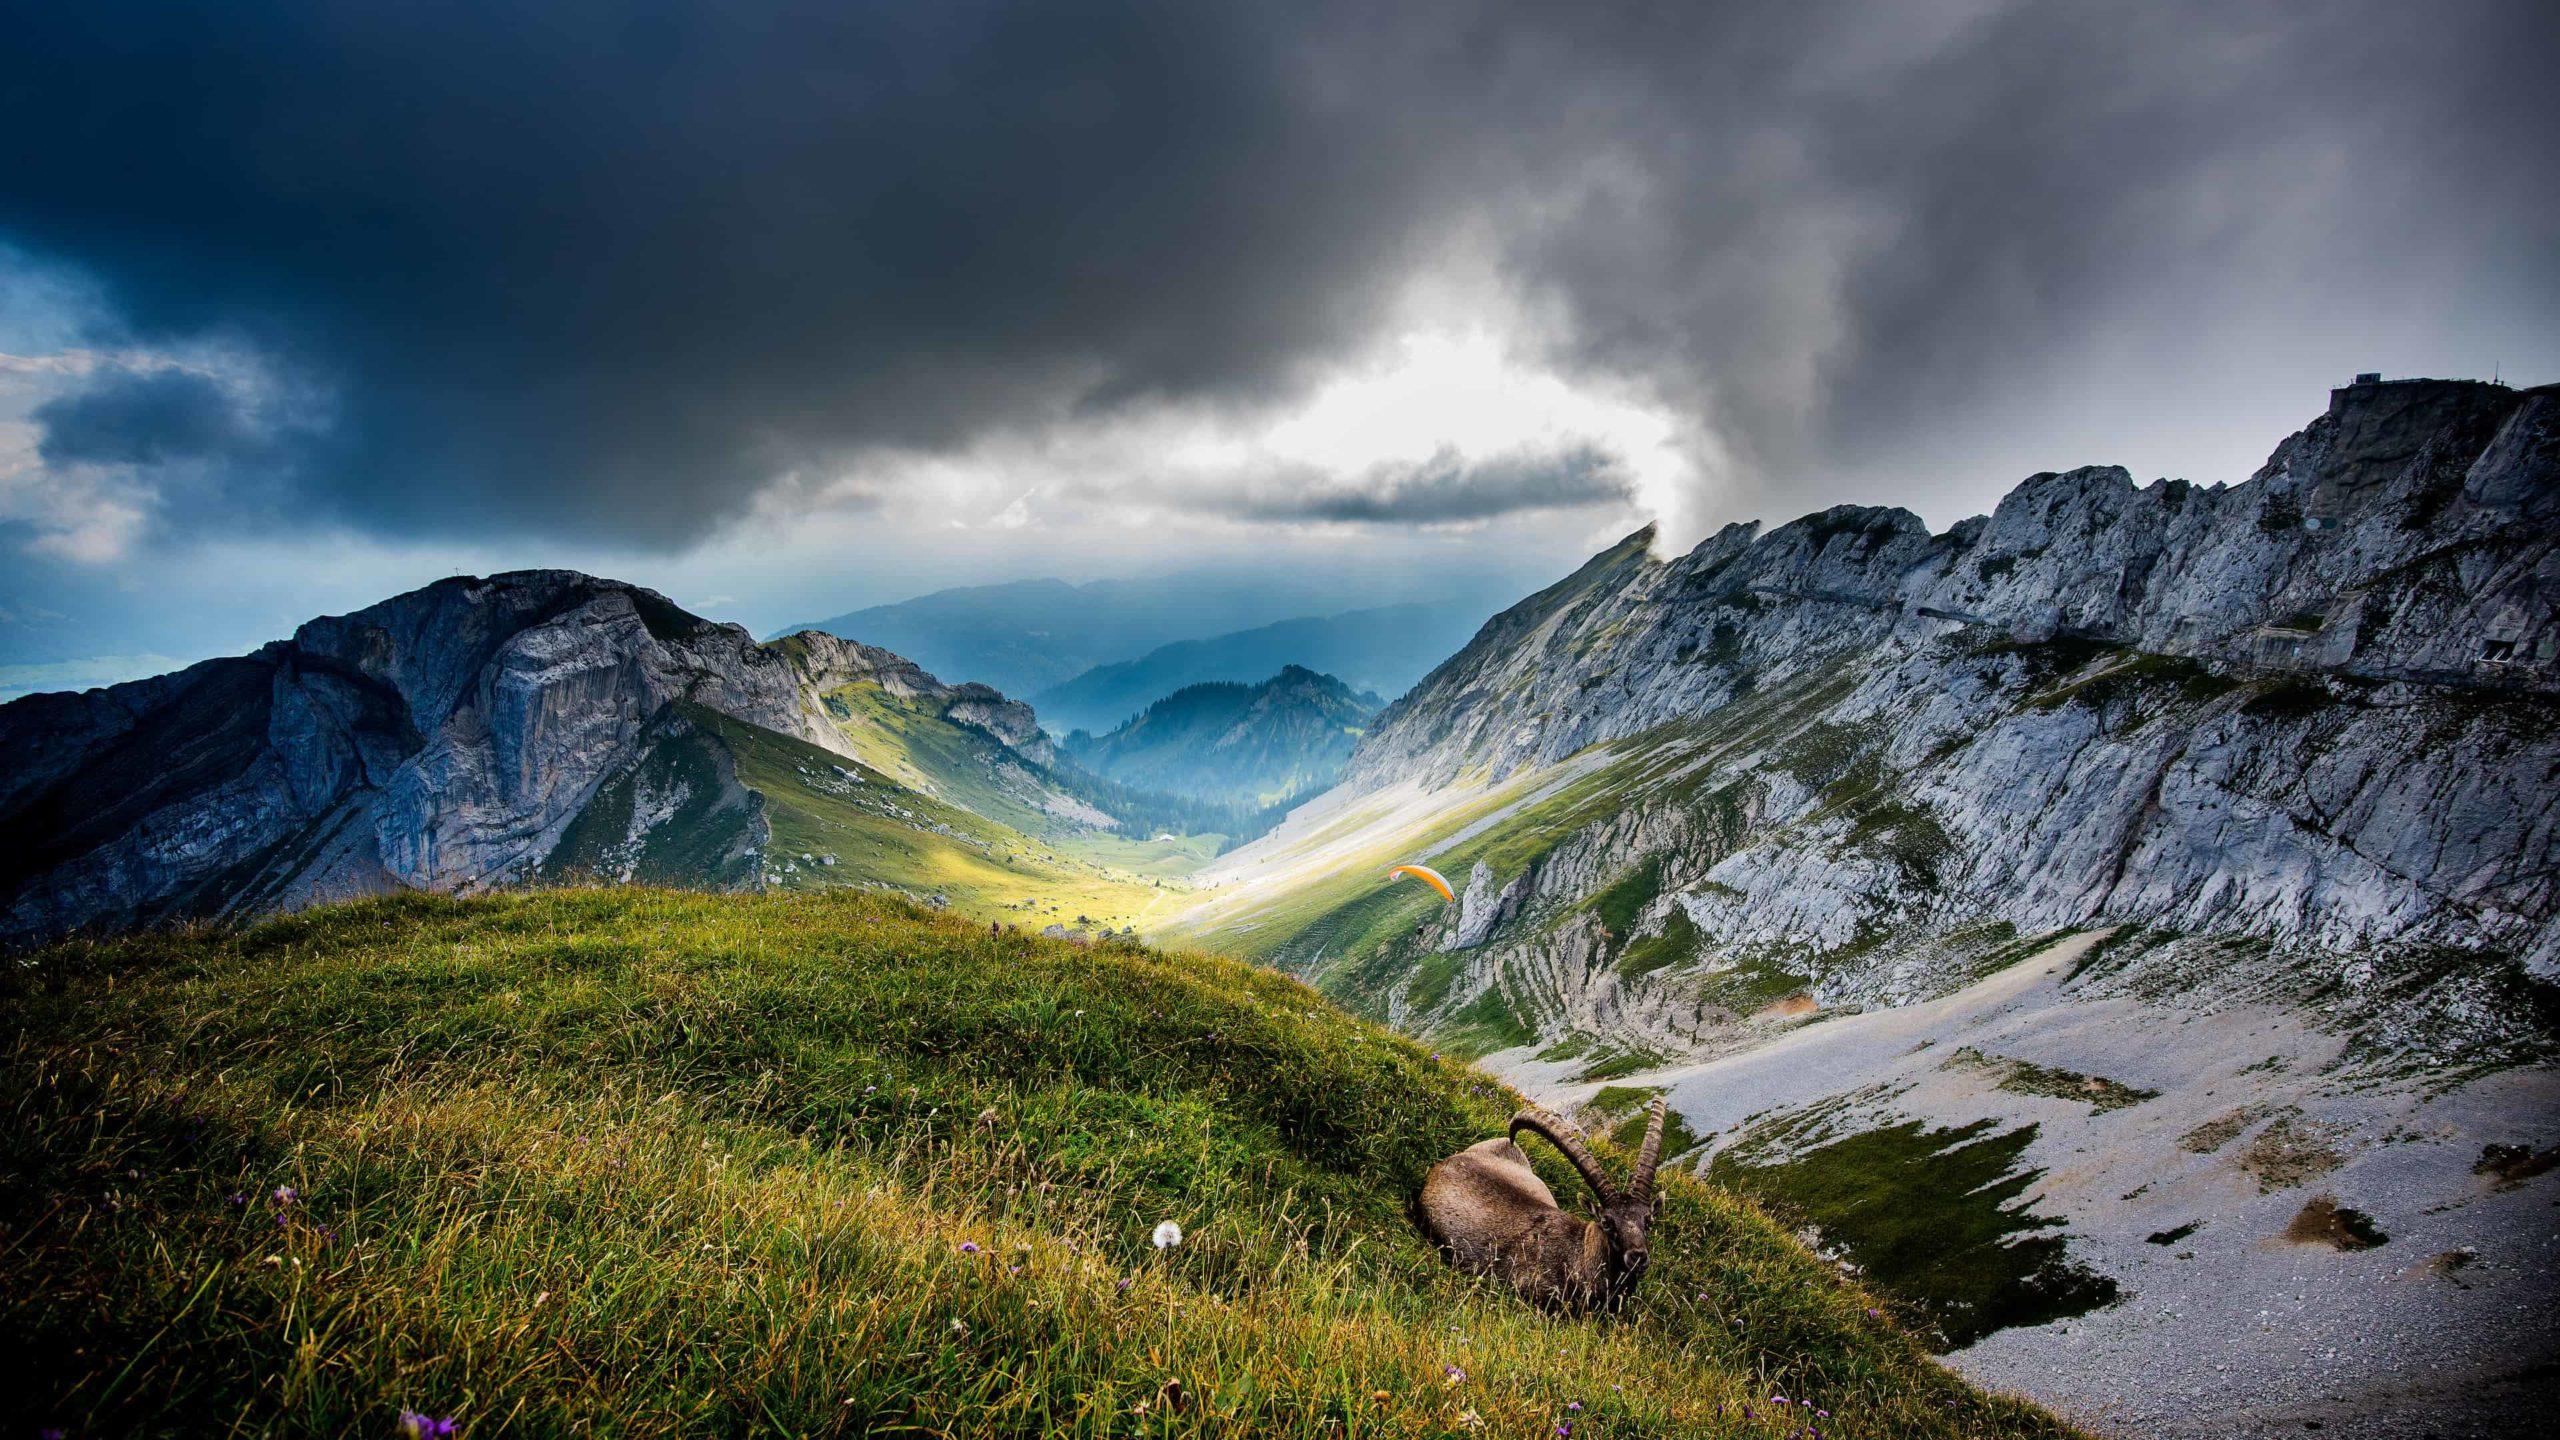 switzerland background pictures